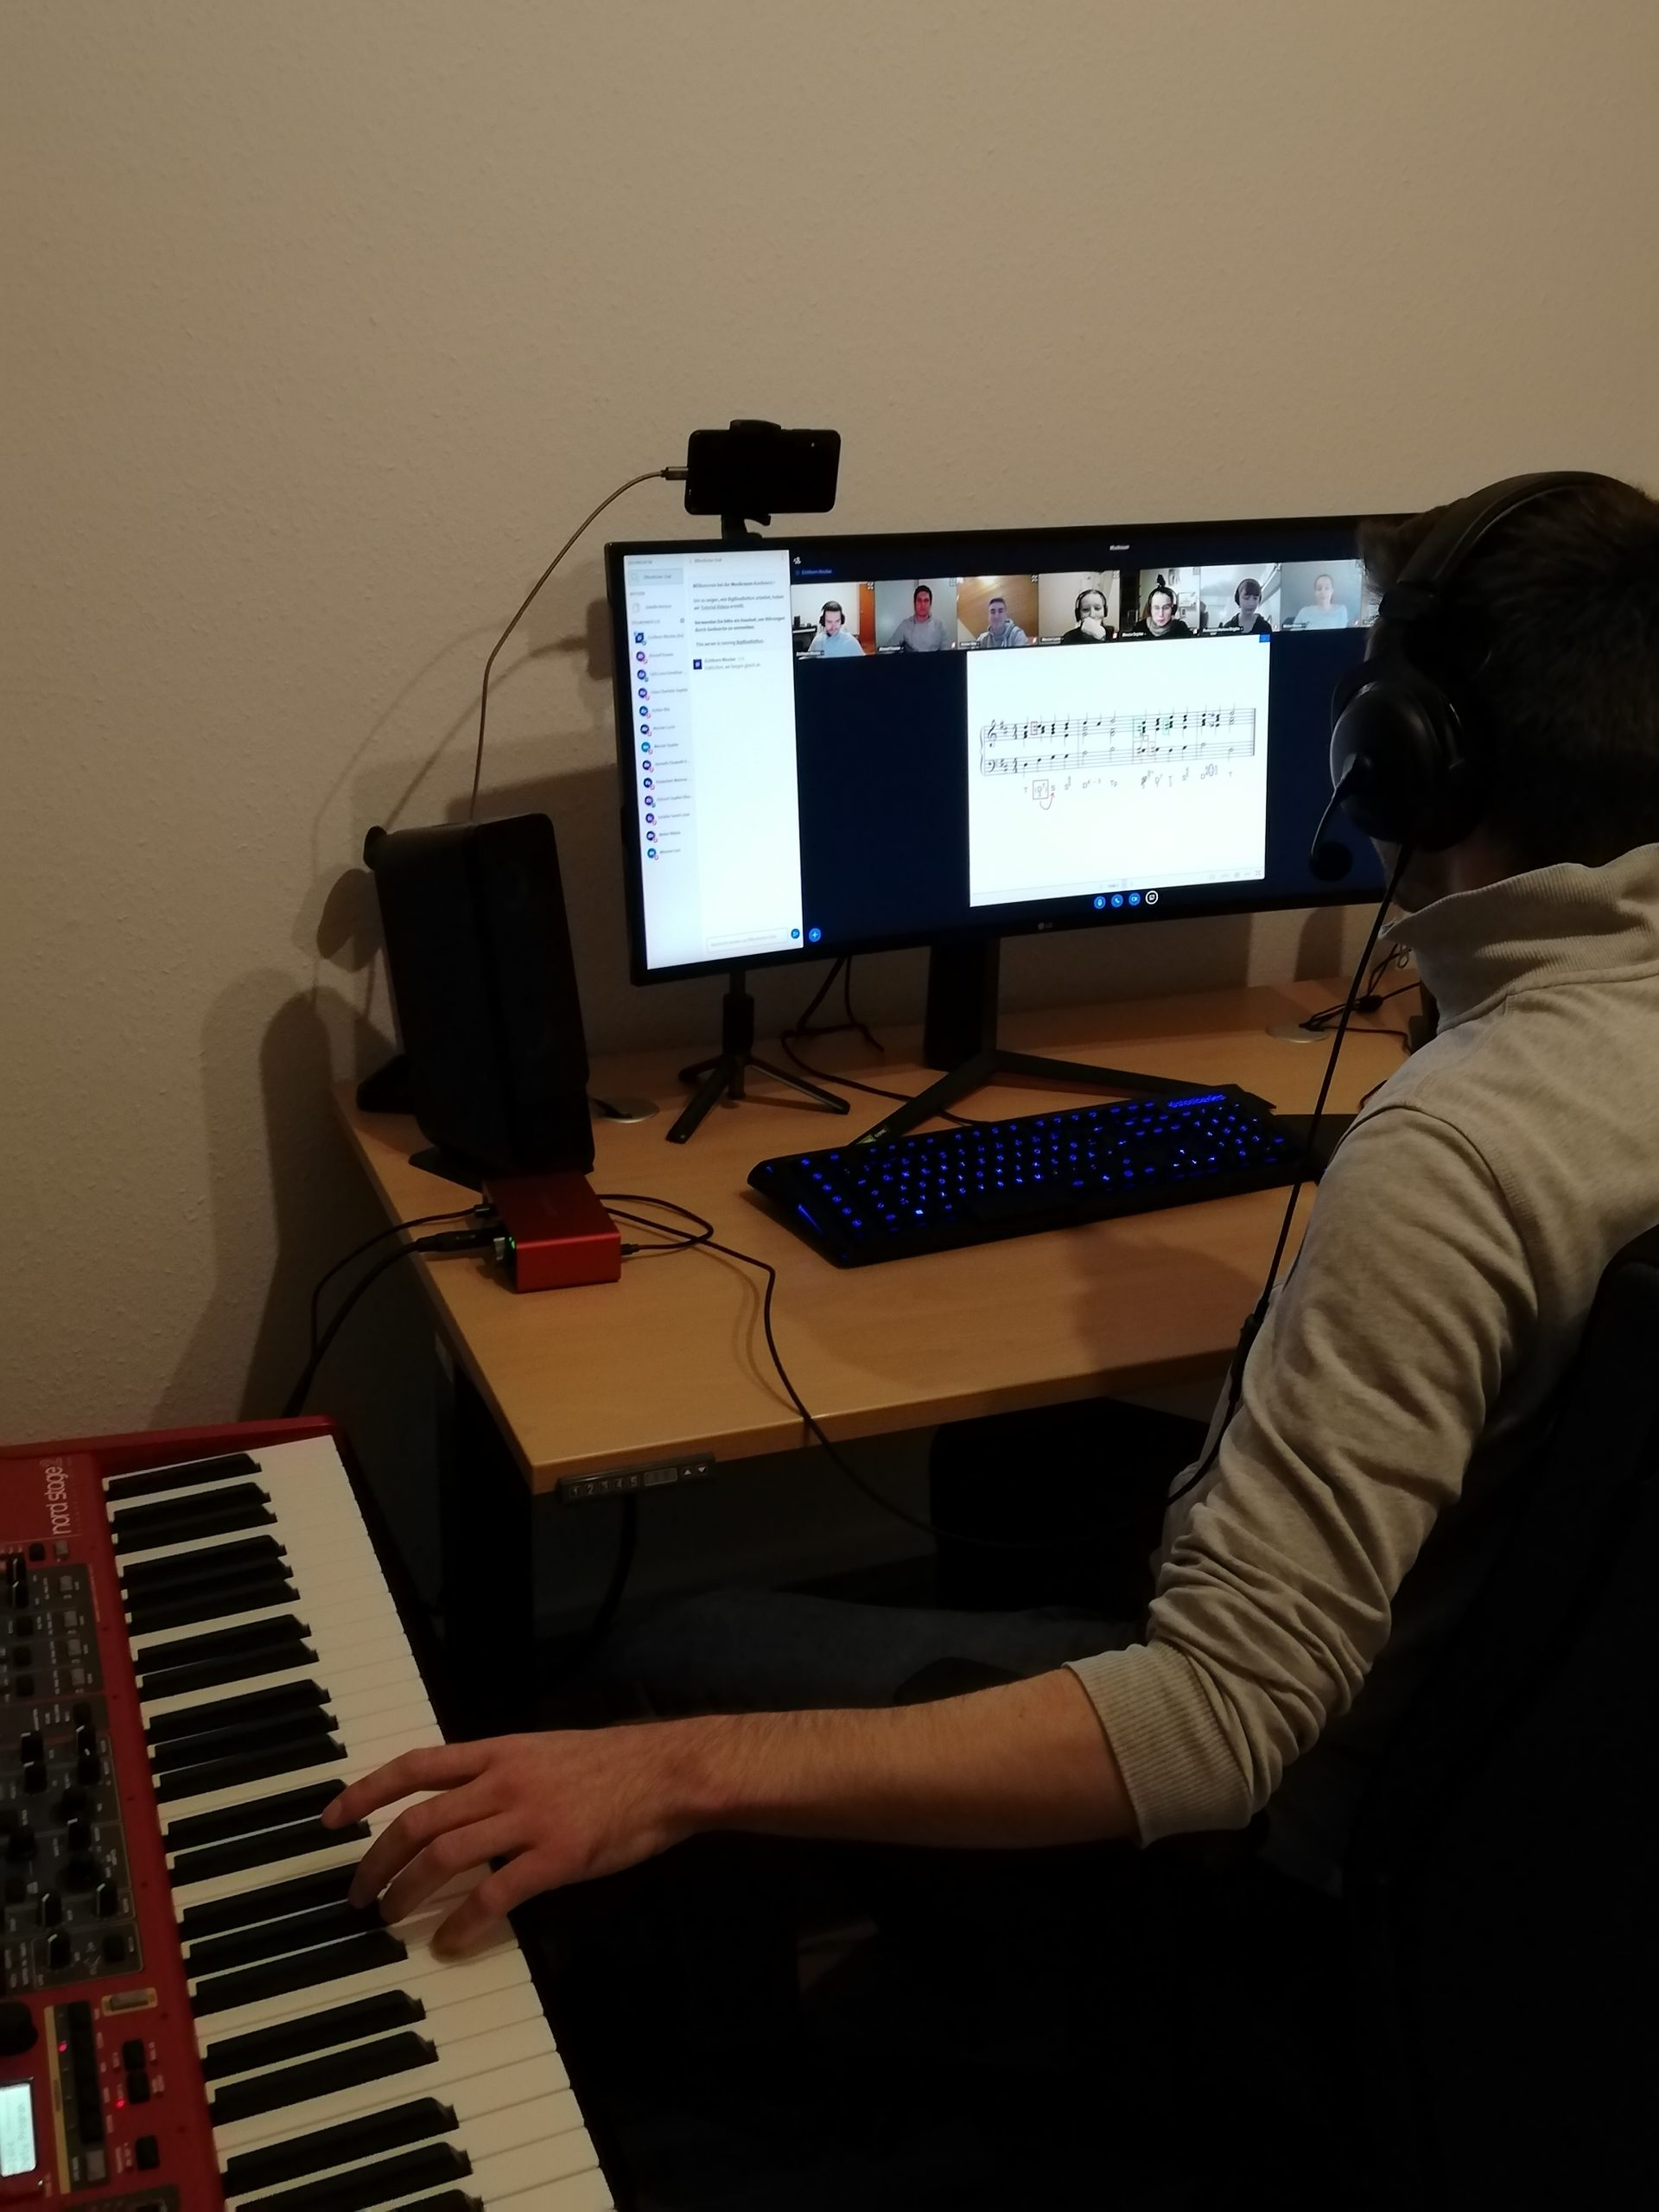 Gehörbildung und Musiktheorie virtuell